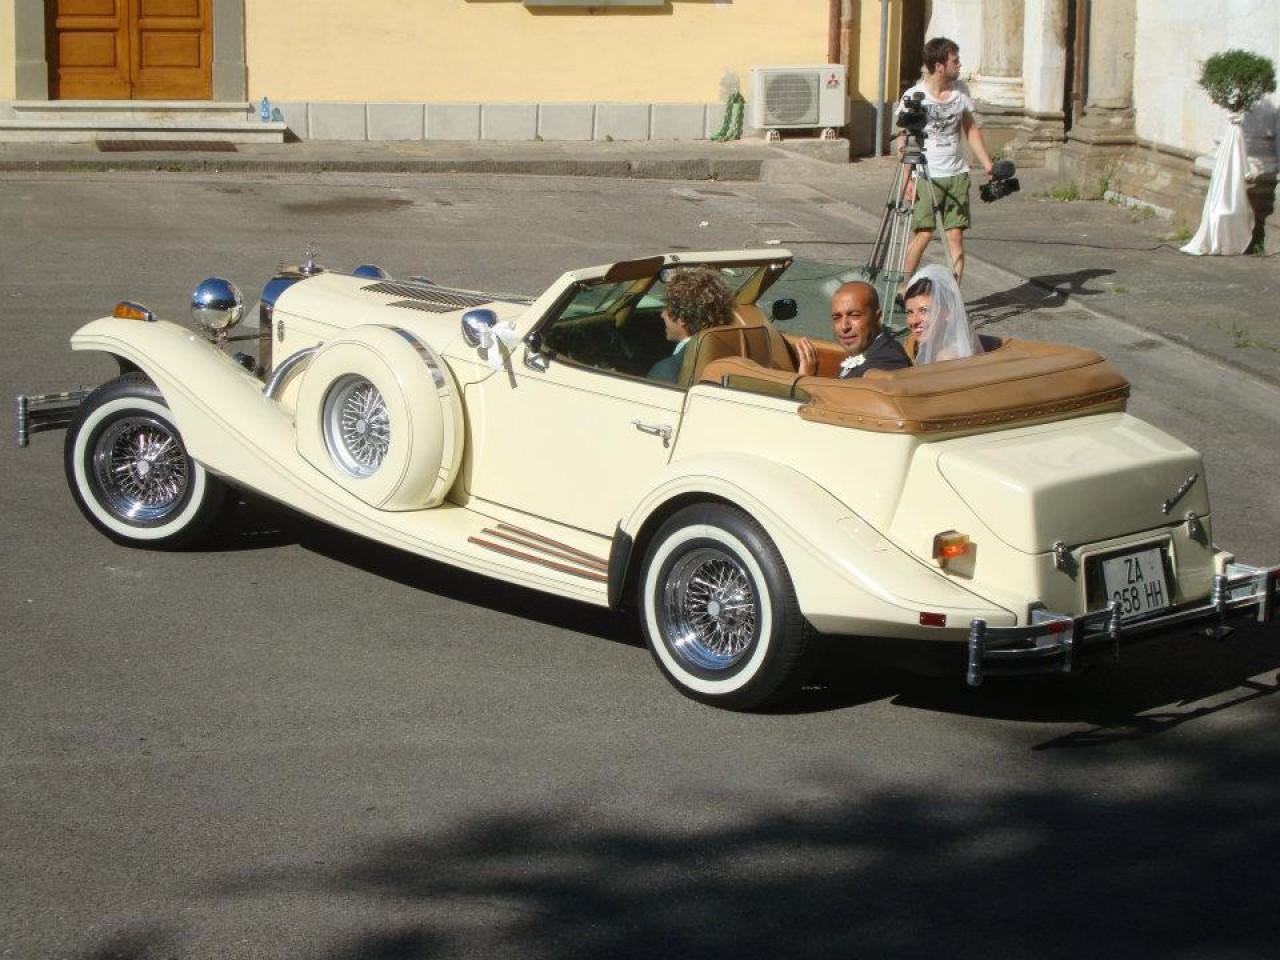 emanuel noleggio limousine e auto d 39 epoca per matrimonio italiano. Black Bedroom Furniture Sets. Home Design Ideas